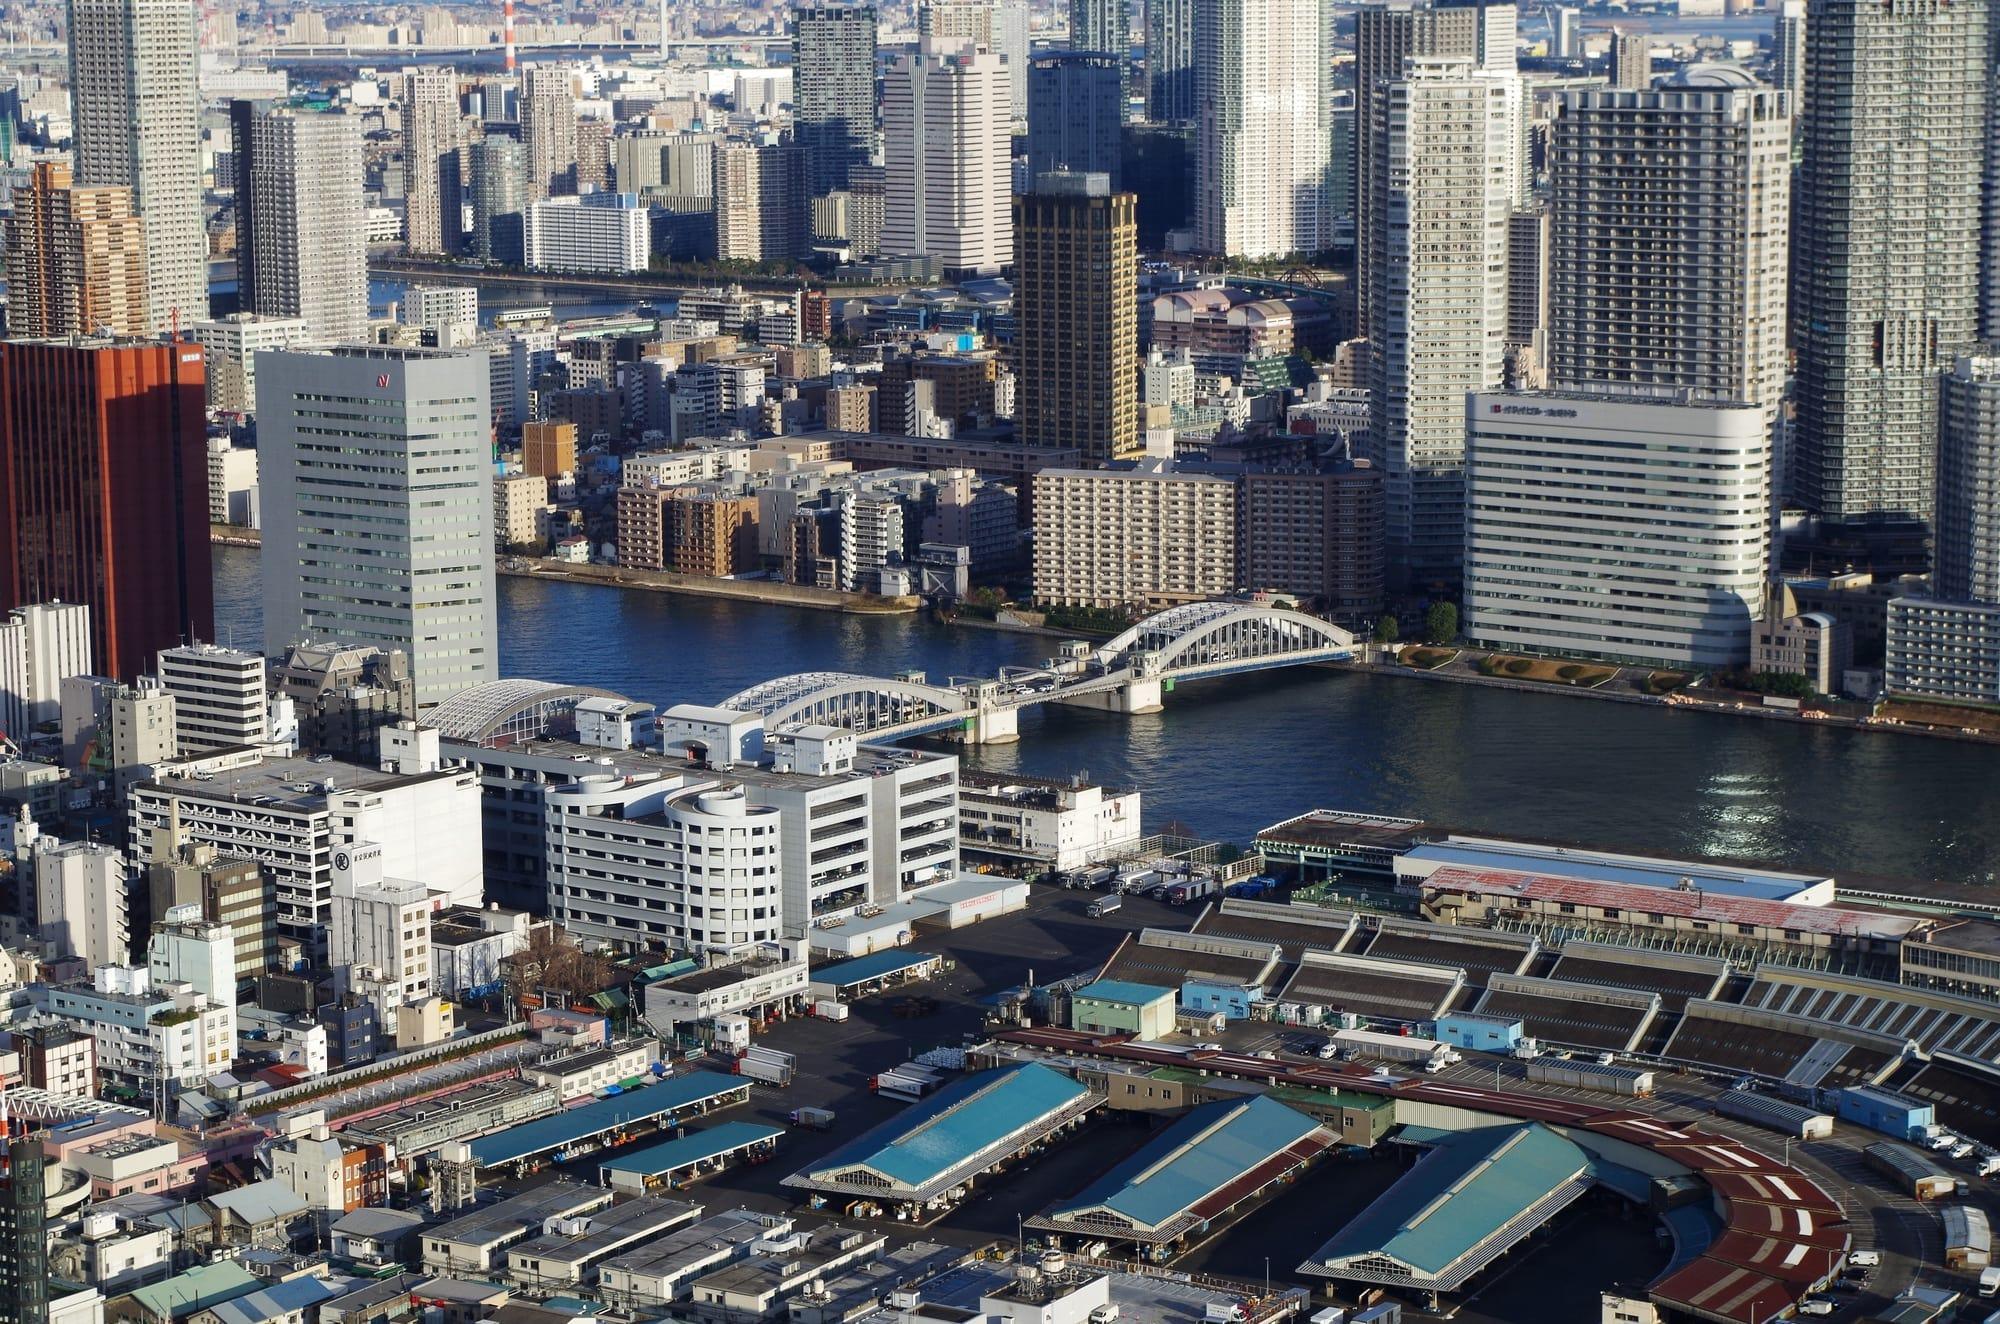 About Kachidoki Bridge